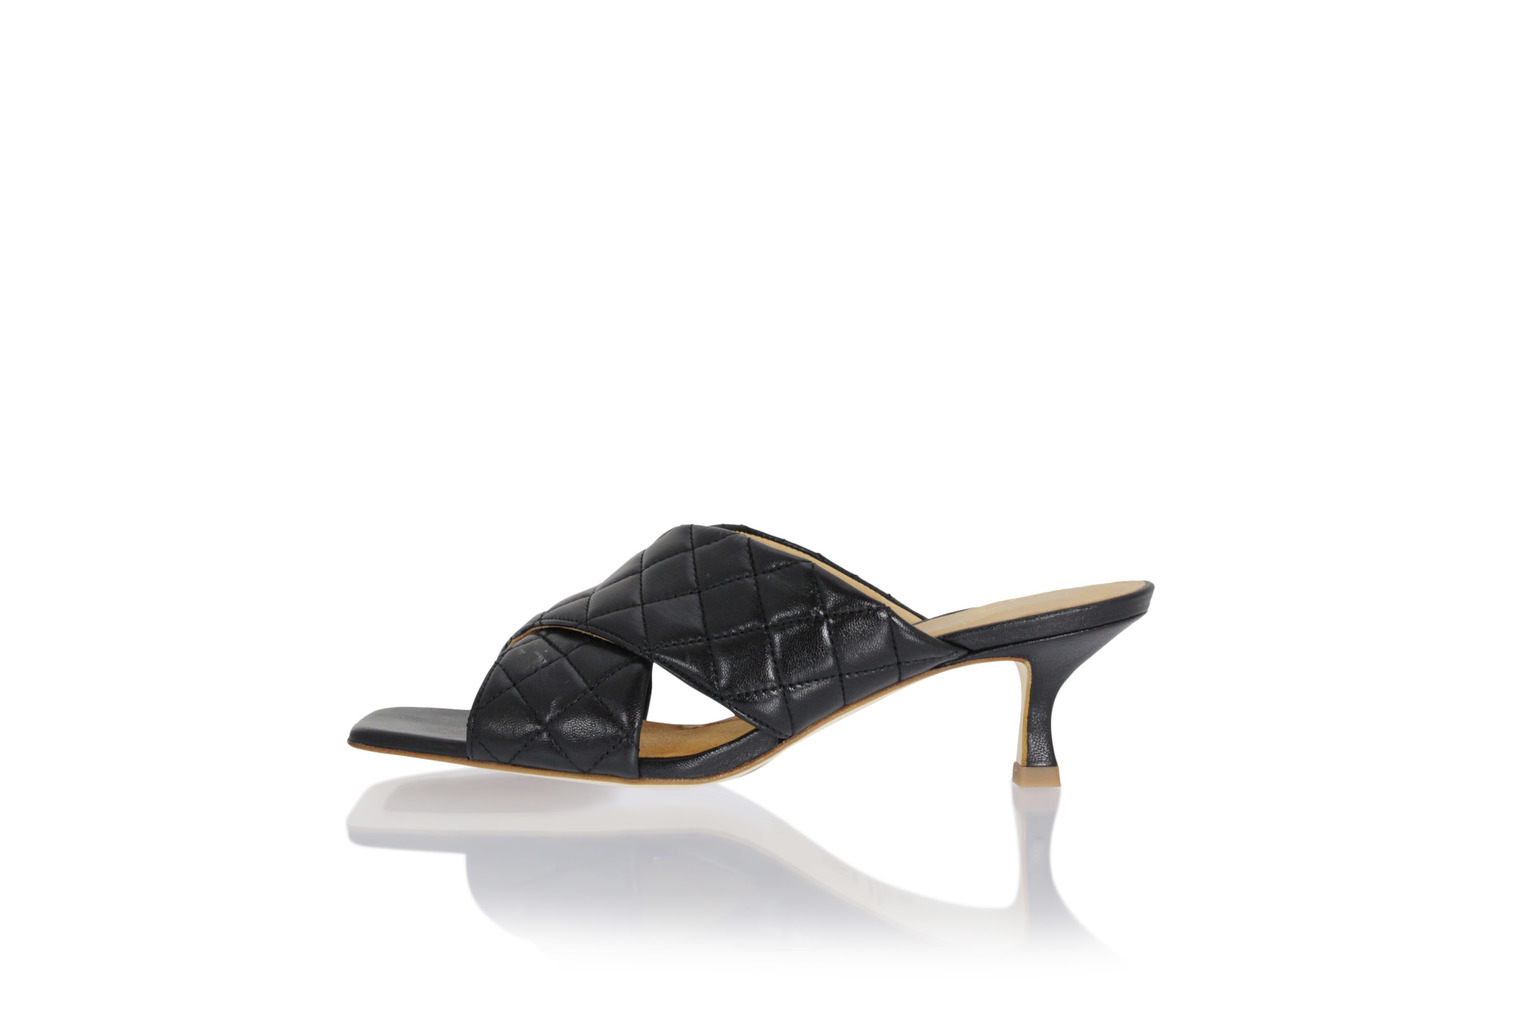 Billi Bi 2626 sandal